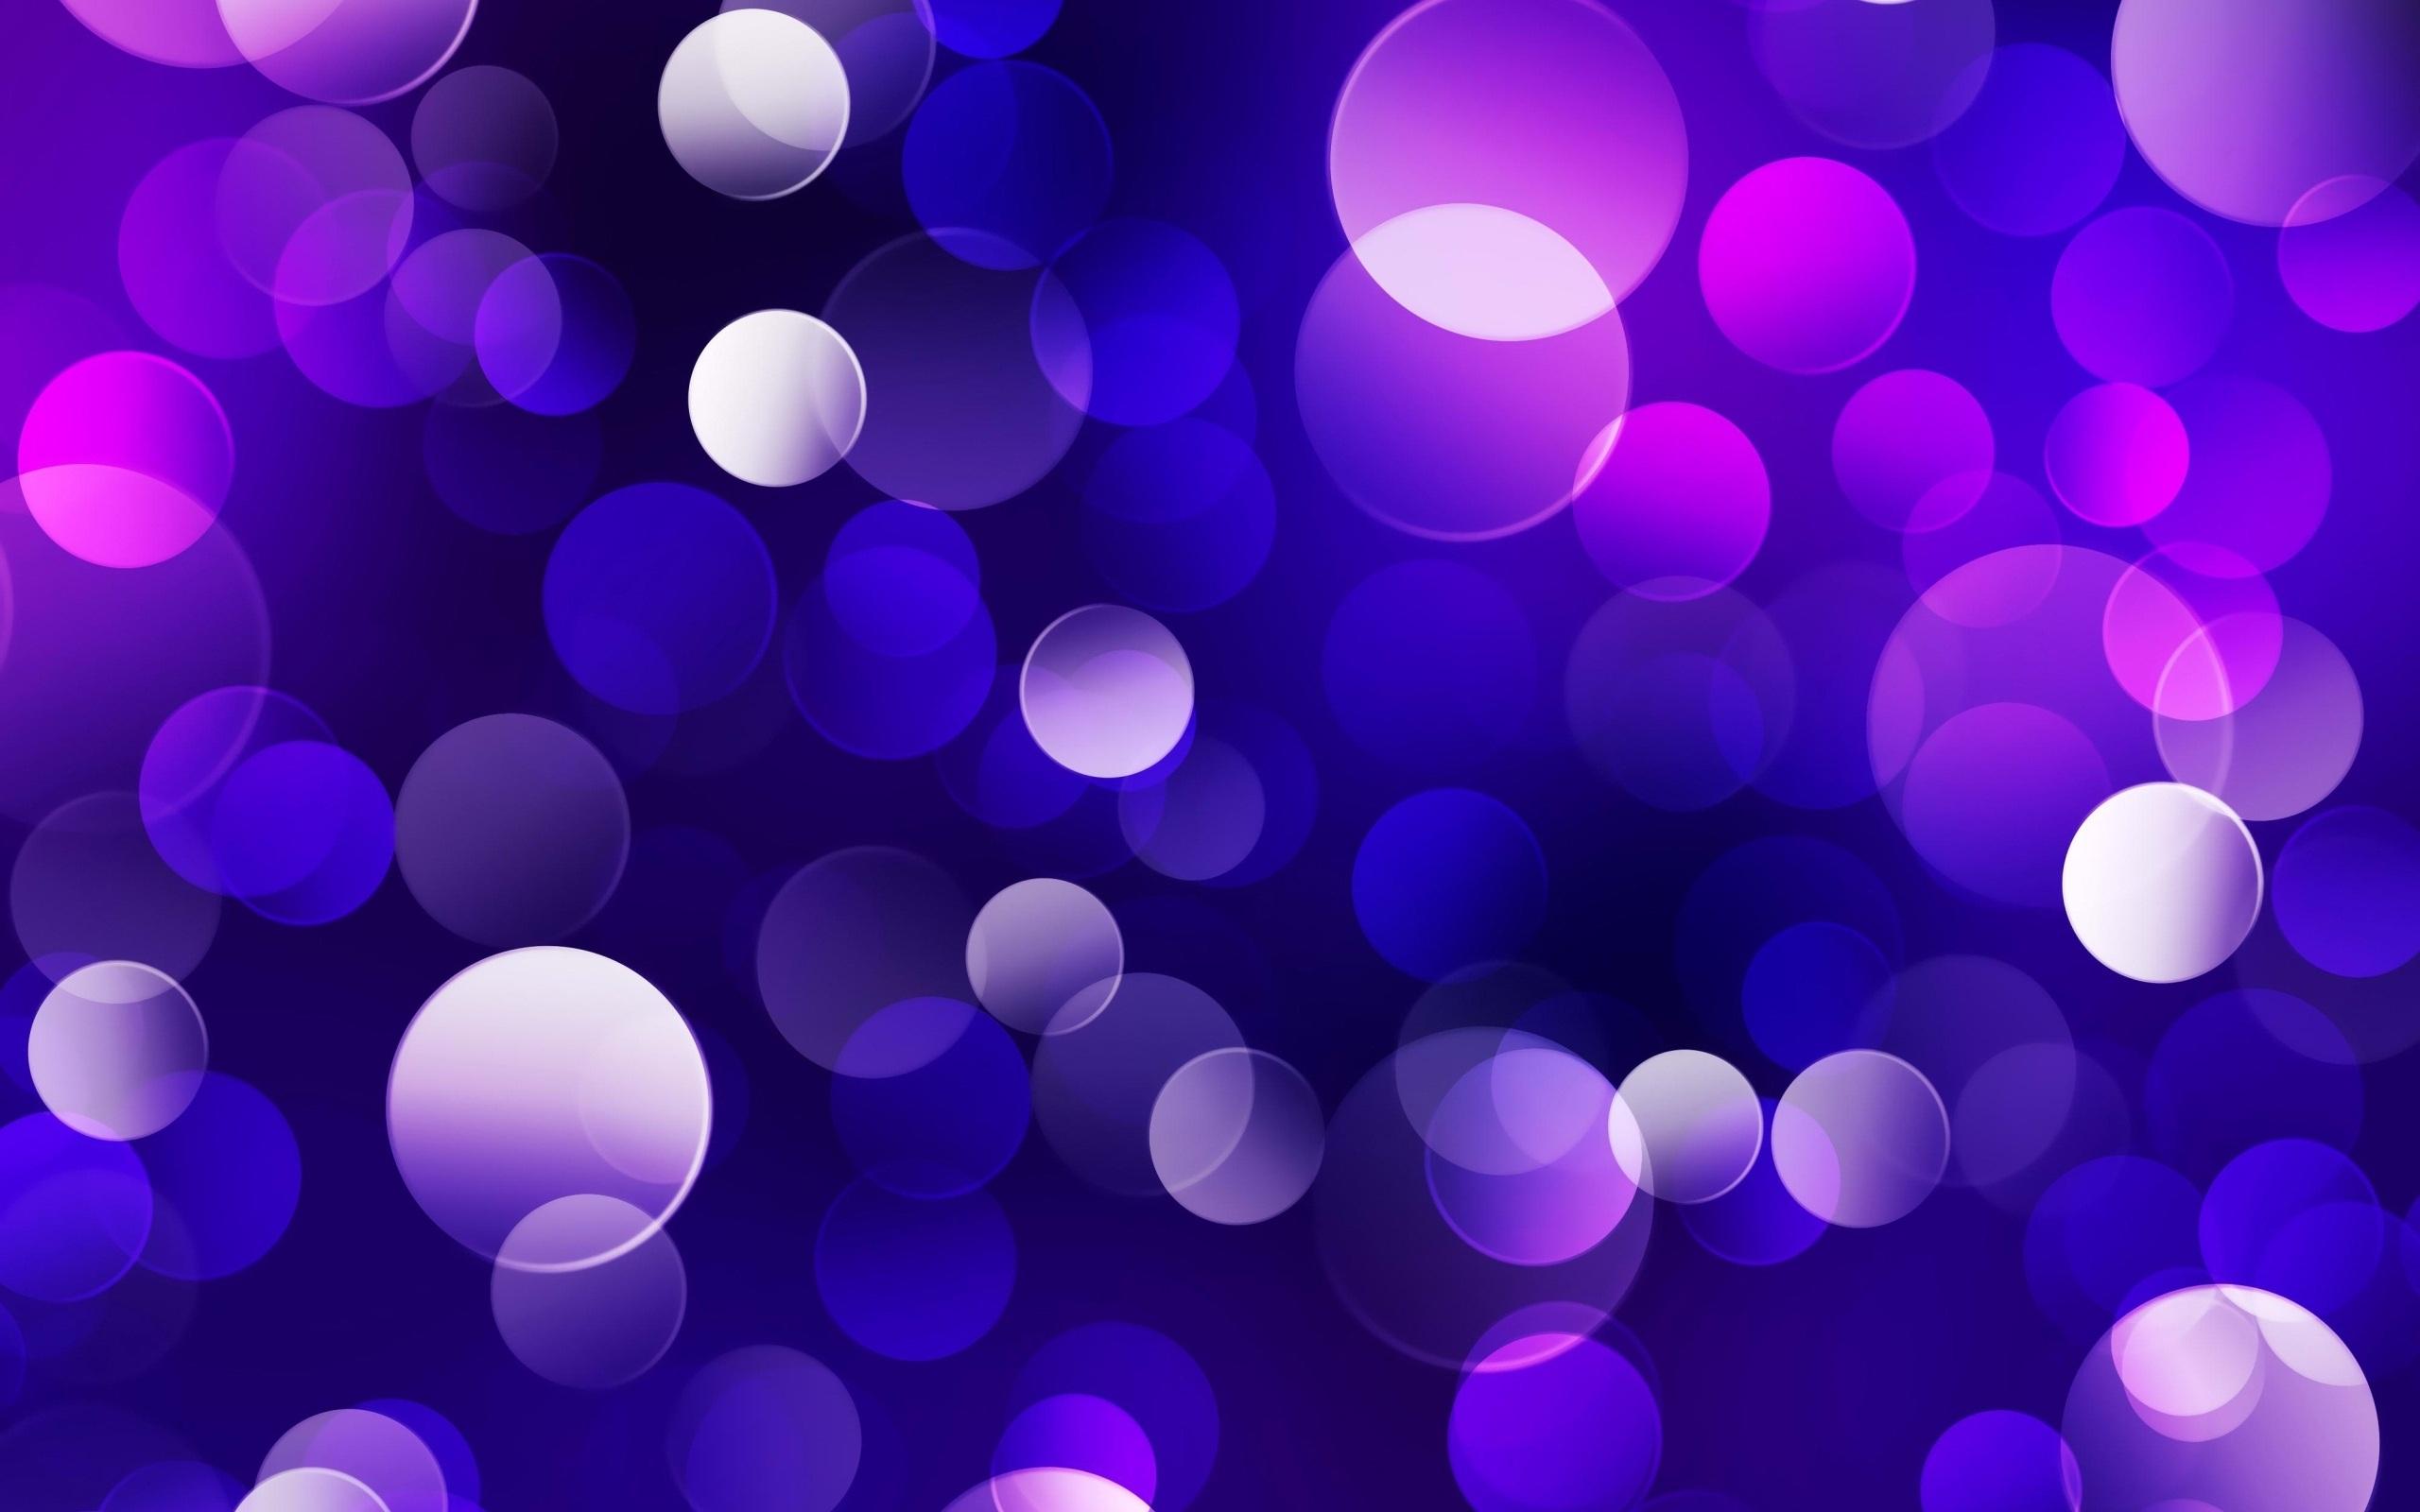 Shiny wallpaper 1920x1080 45448 2560x1600